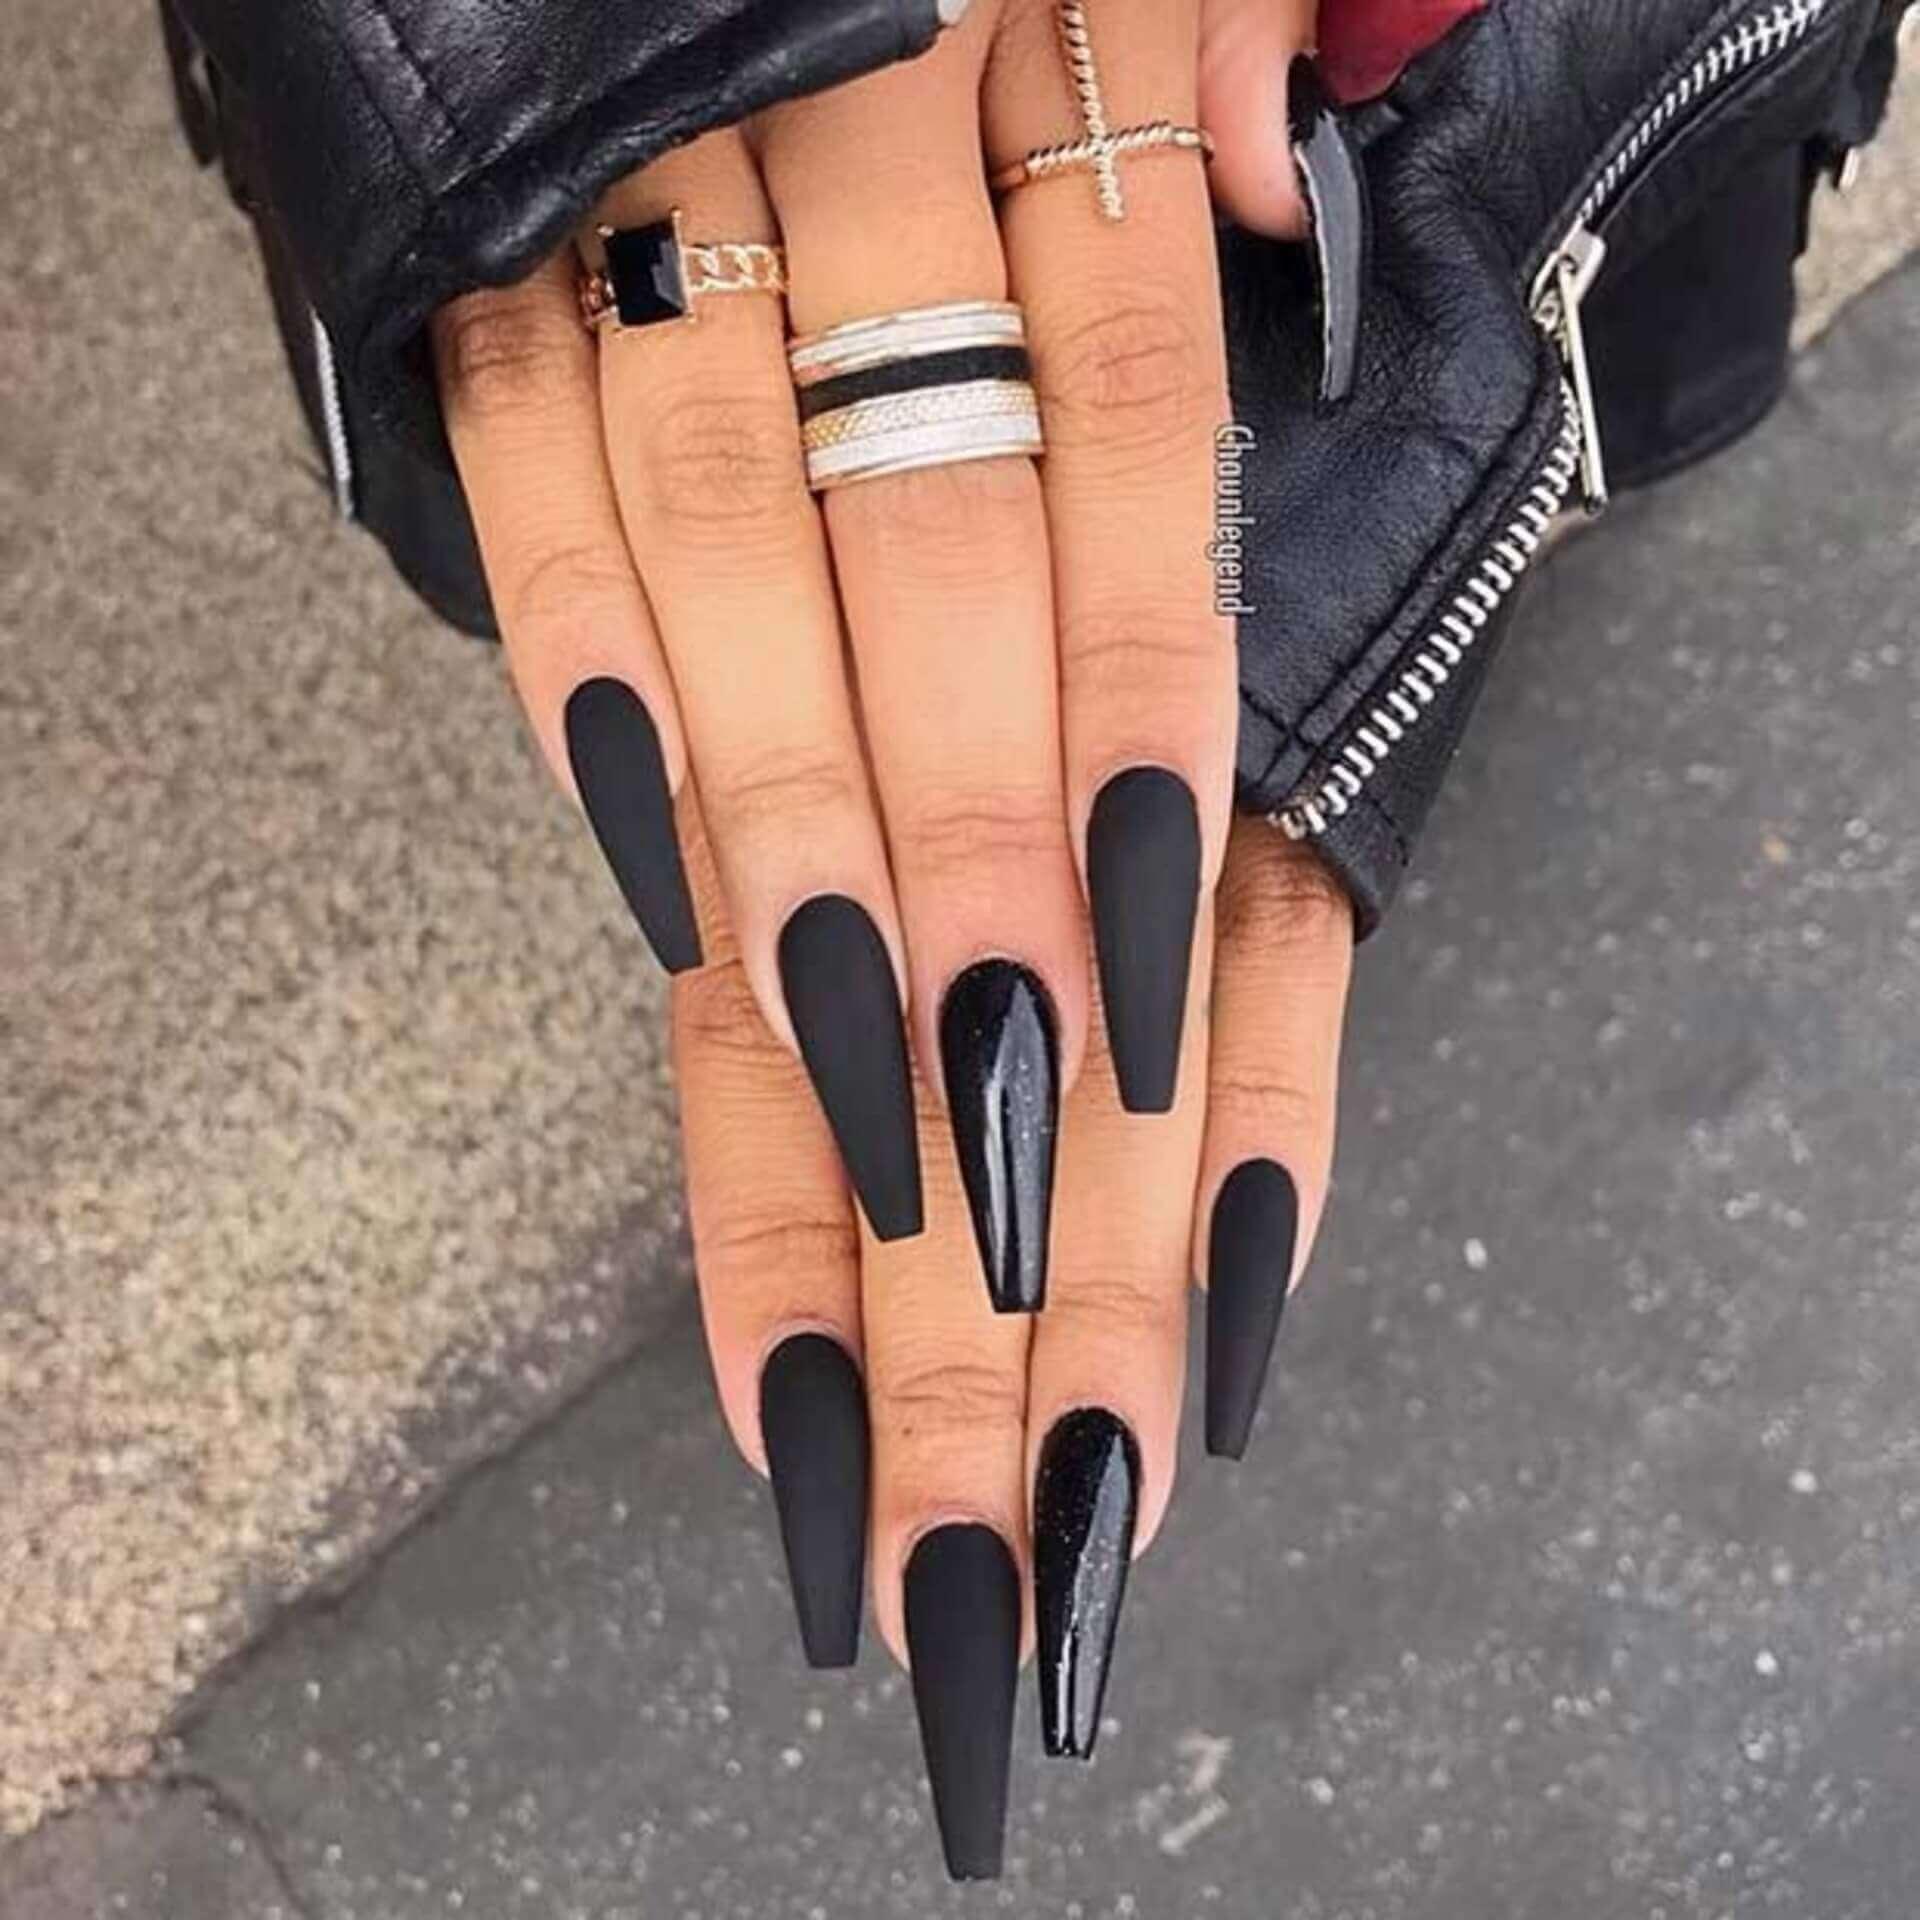 longs ongles noirs mats